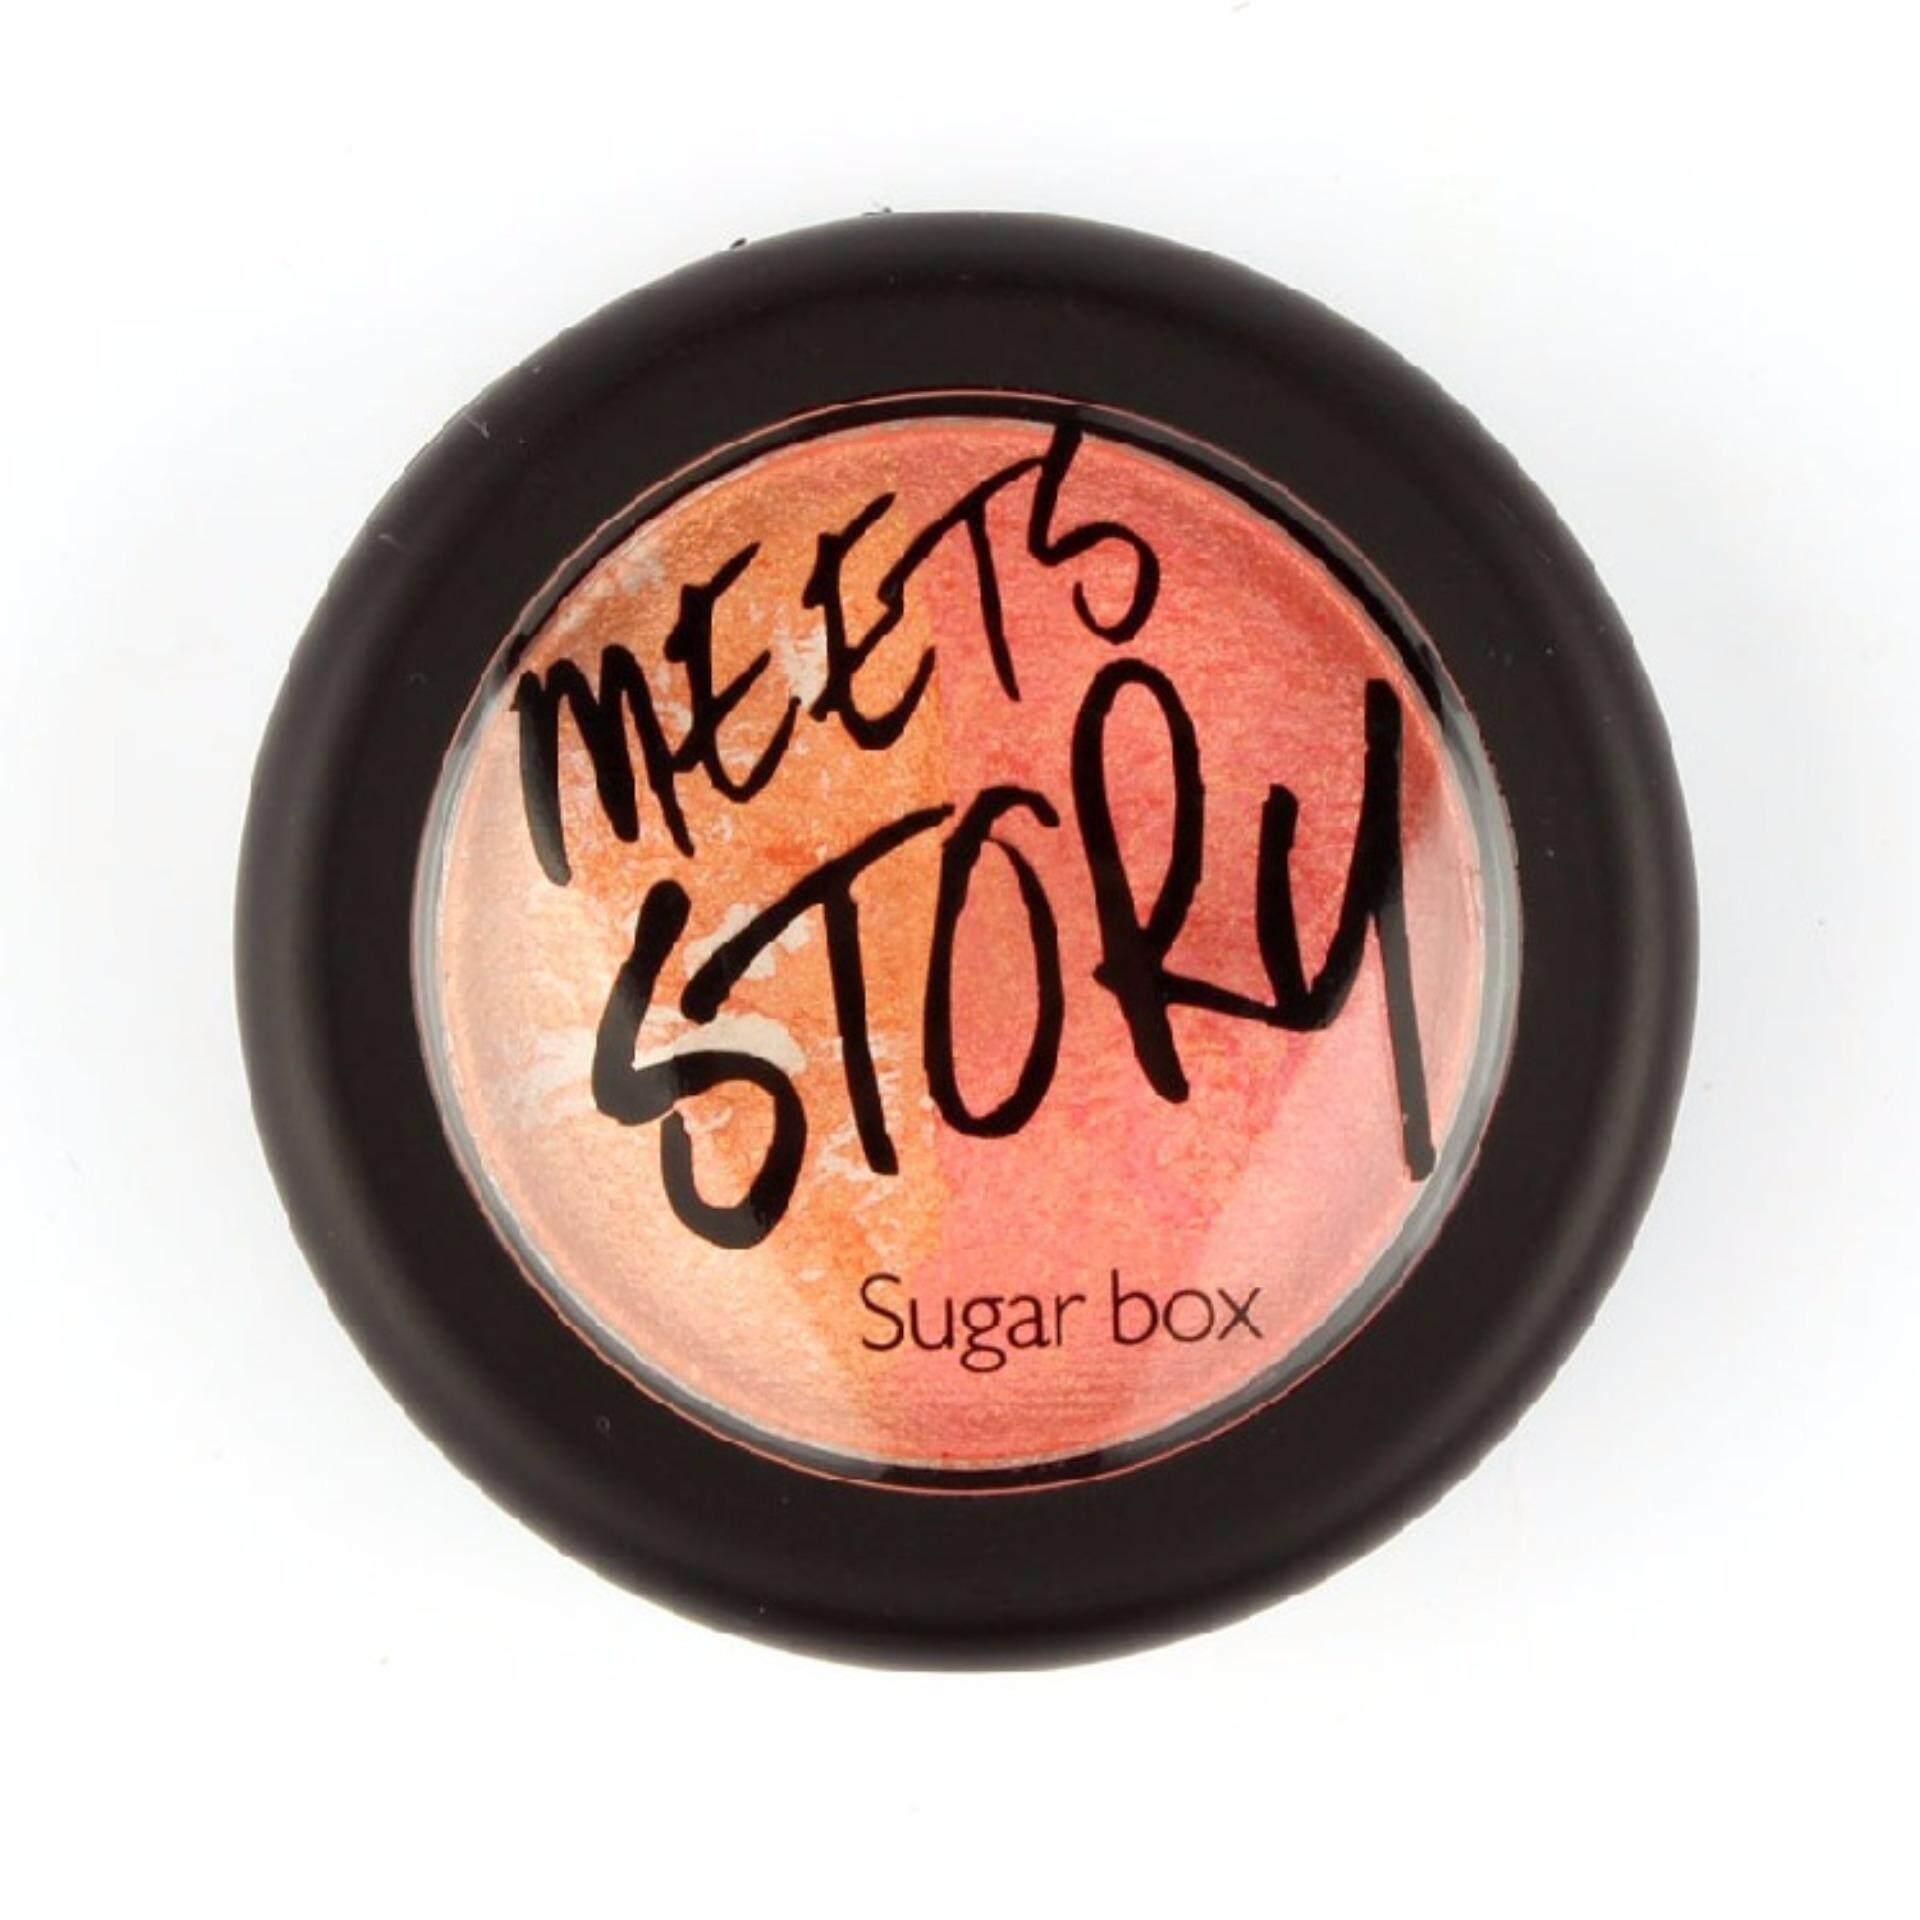 SUGAR BOX Melts Story Face Blush g3gf77h2fe=)